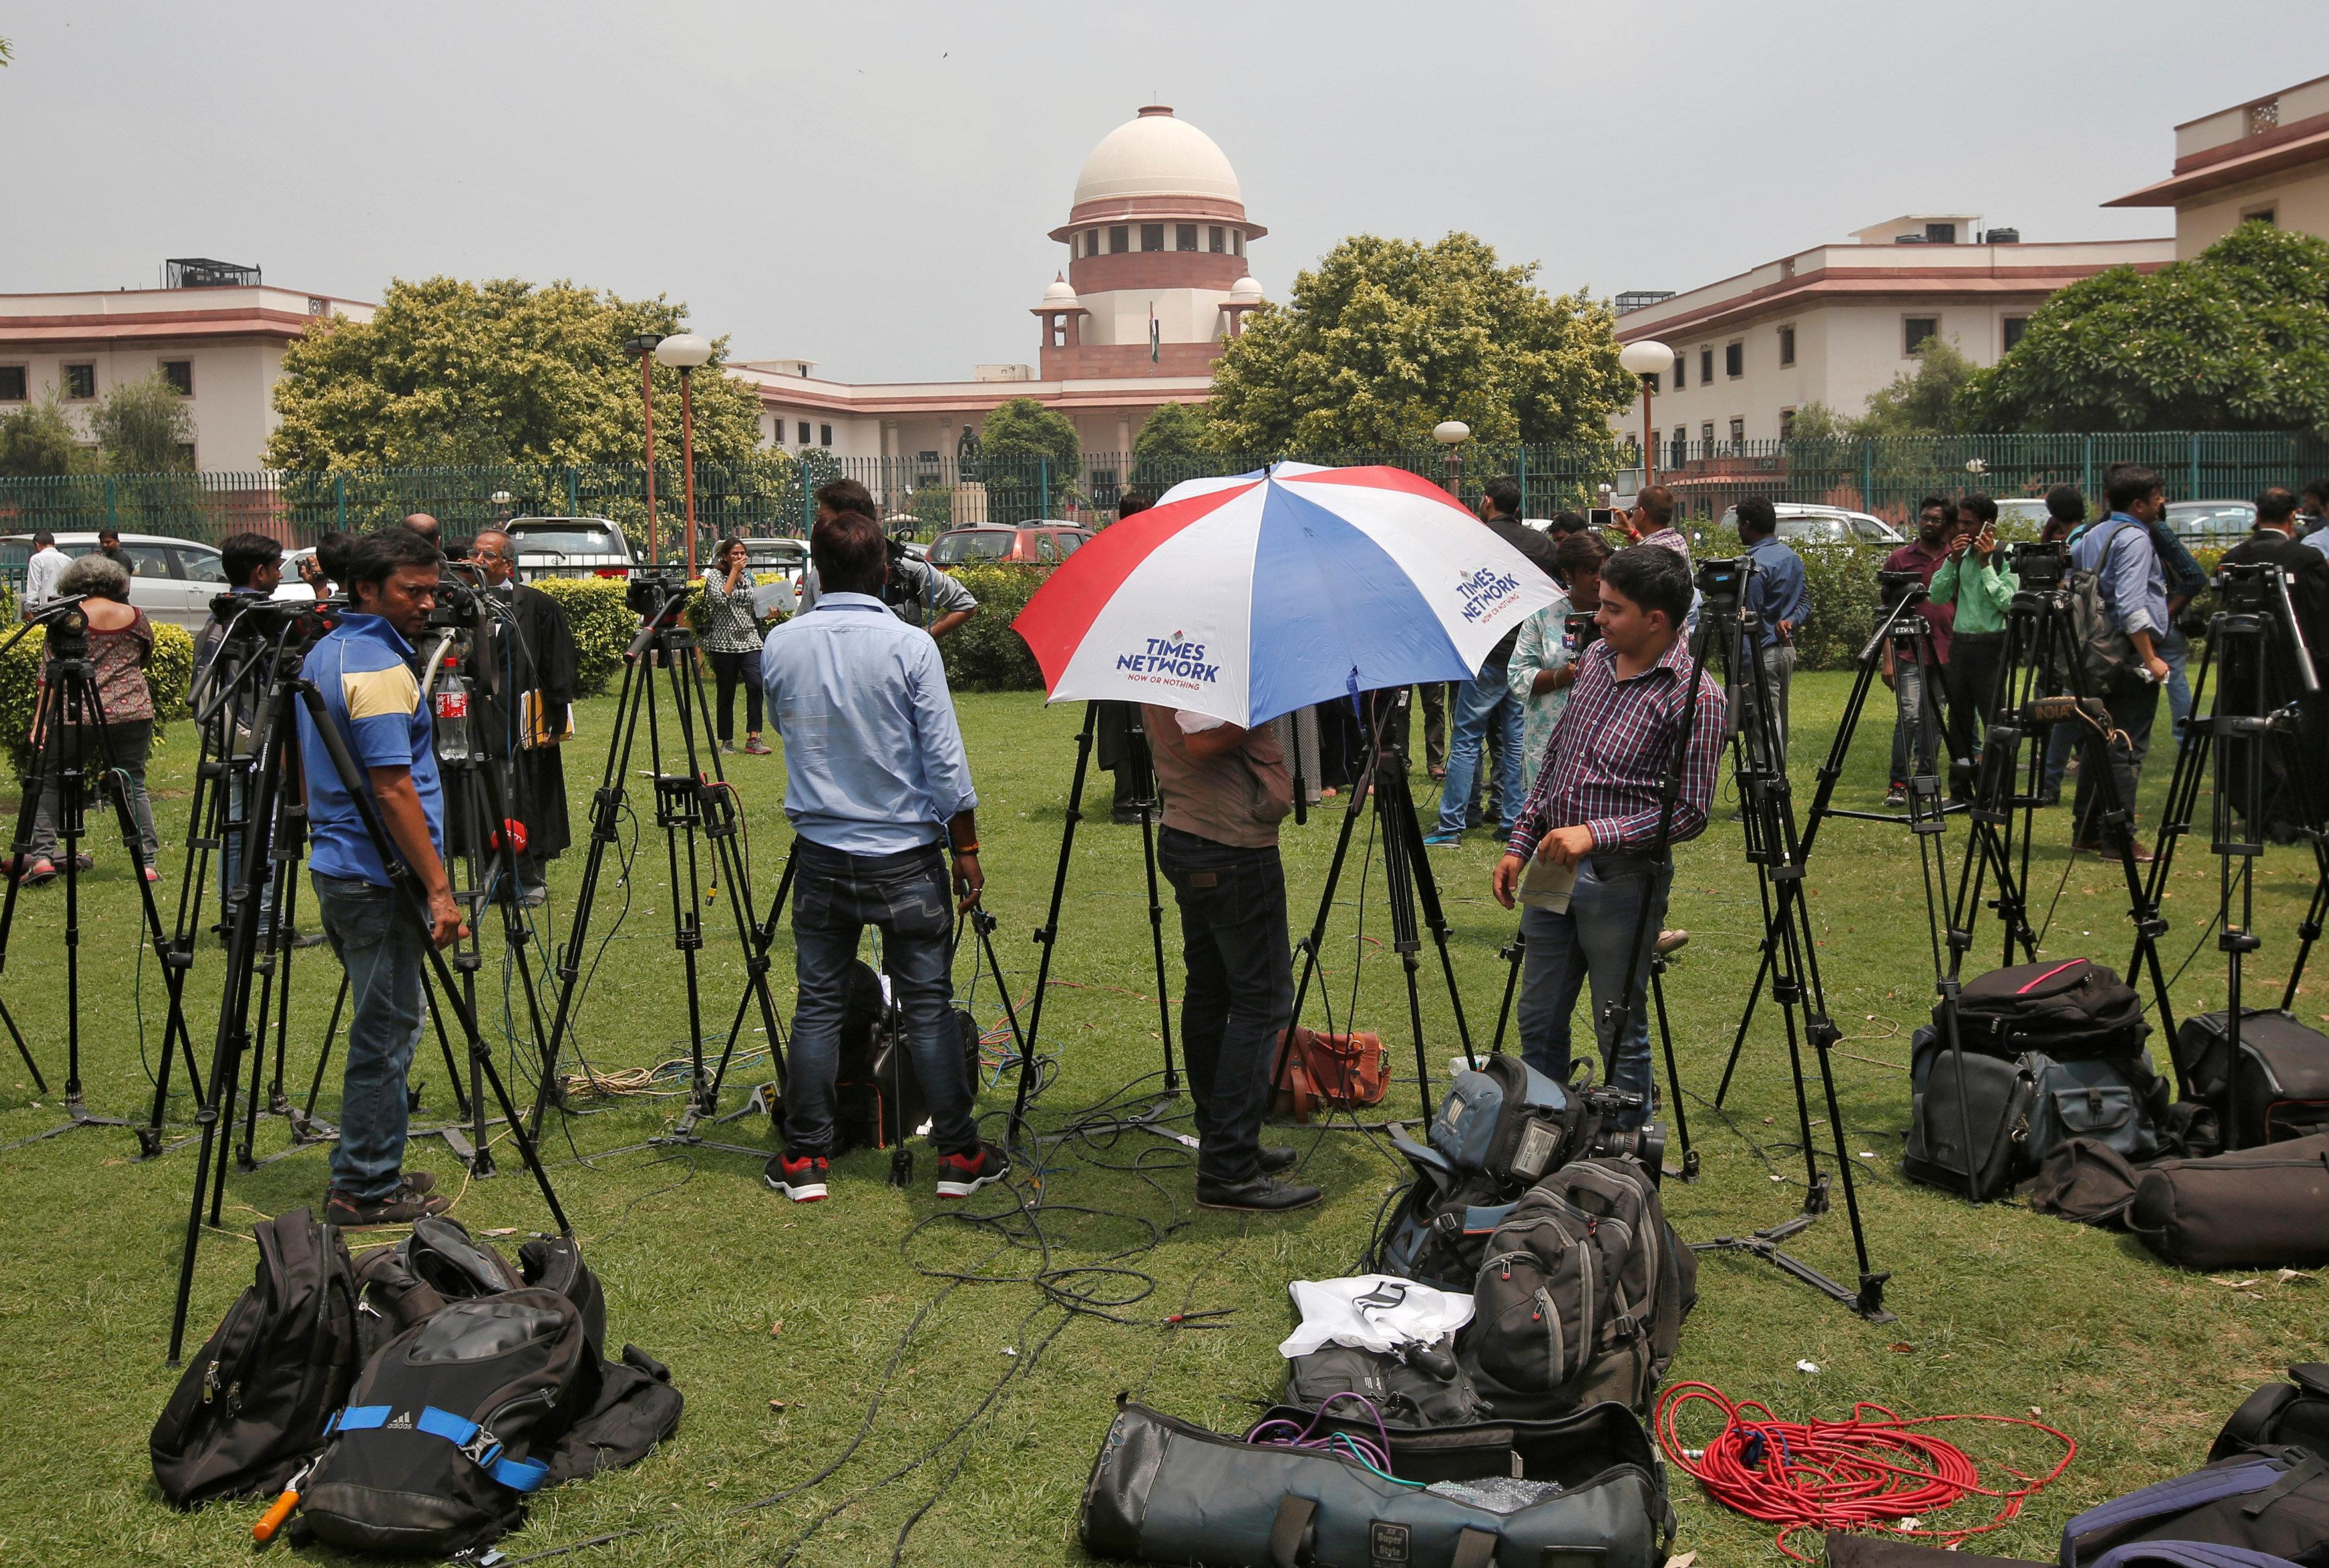 Muslim divorce law 'unconstitutional', rules India's top court - Reuters